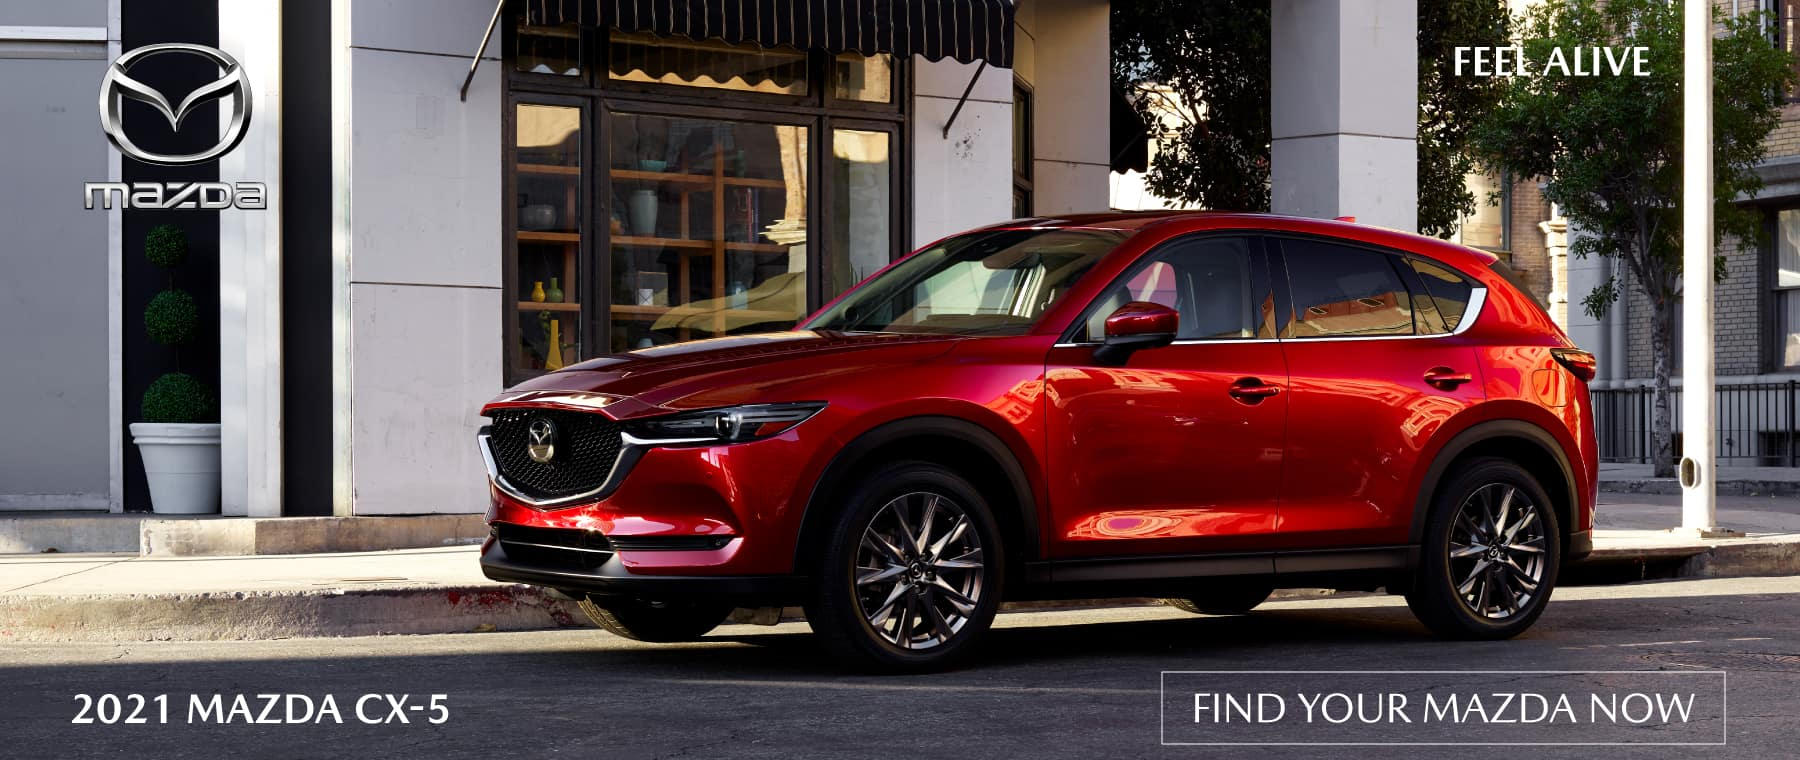 2021-Mazda-CX-5-Banner-1800×760